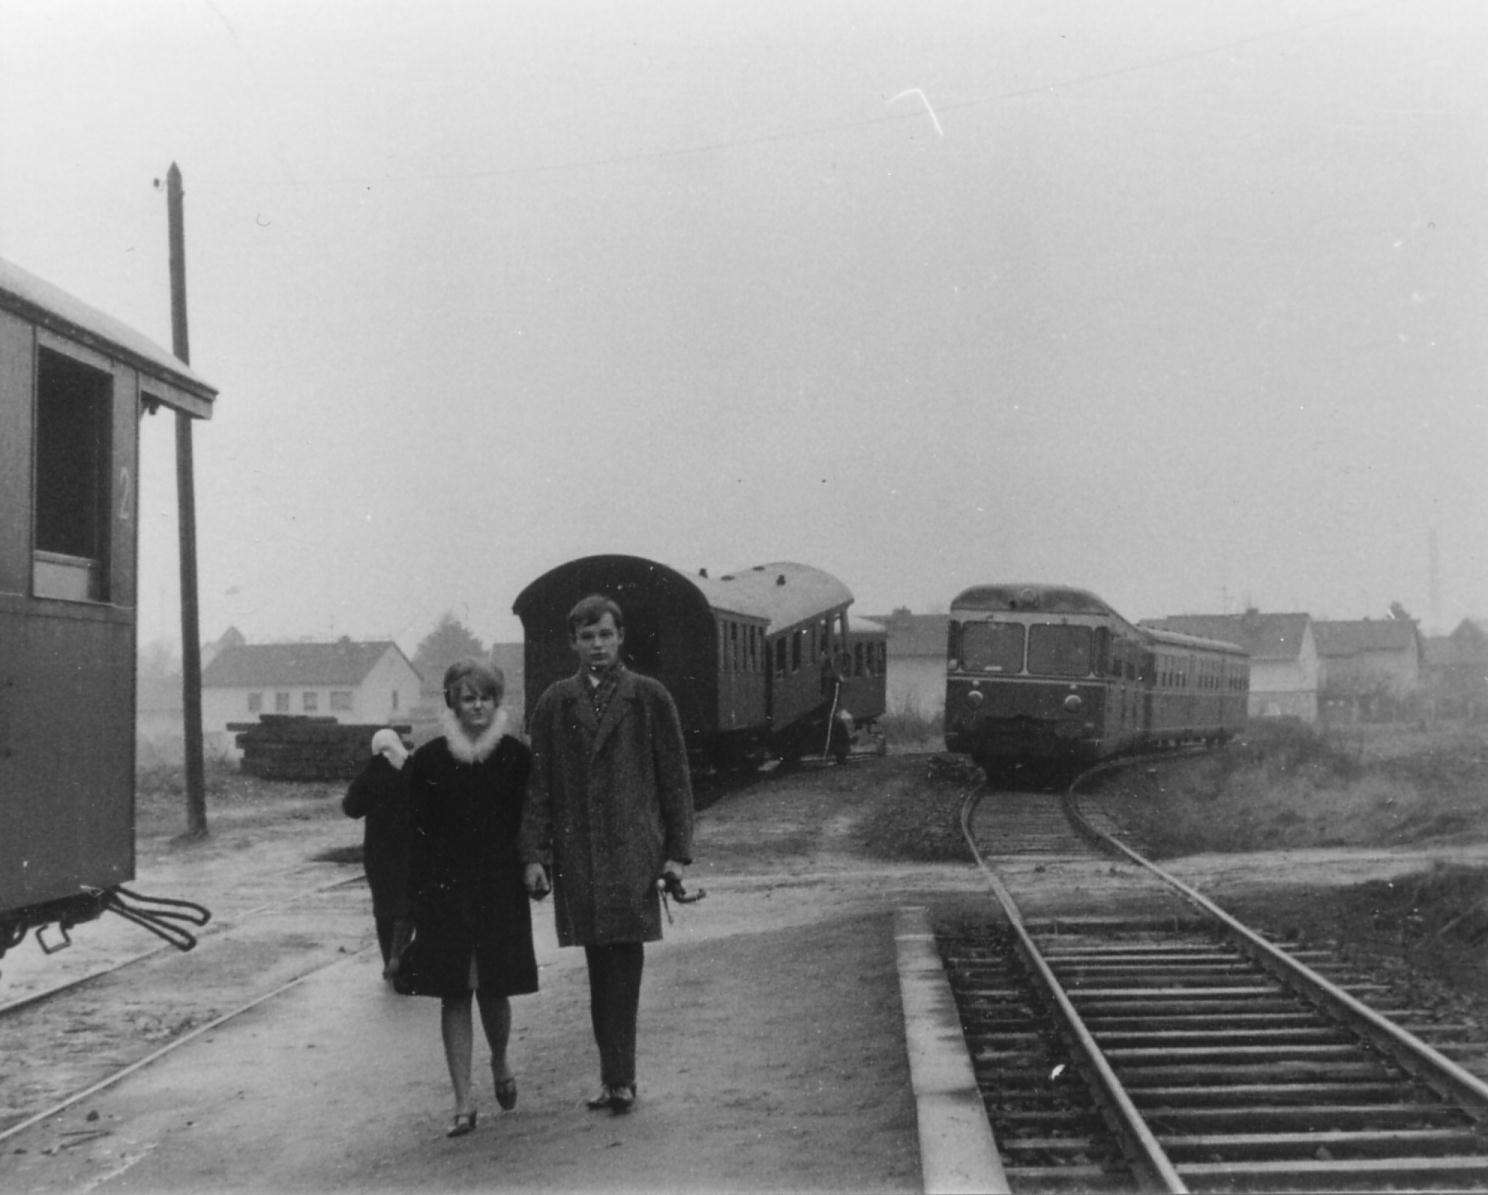 Bahnhof 309.3